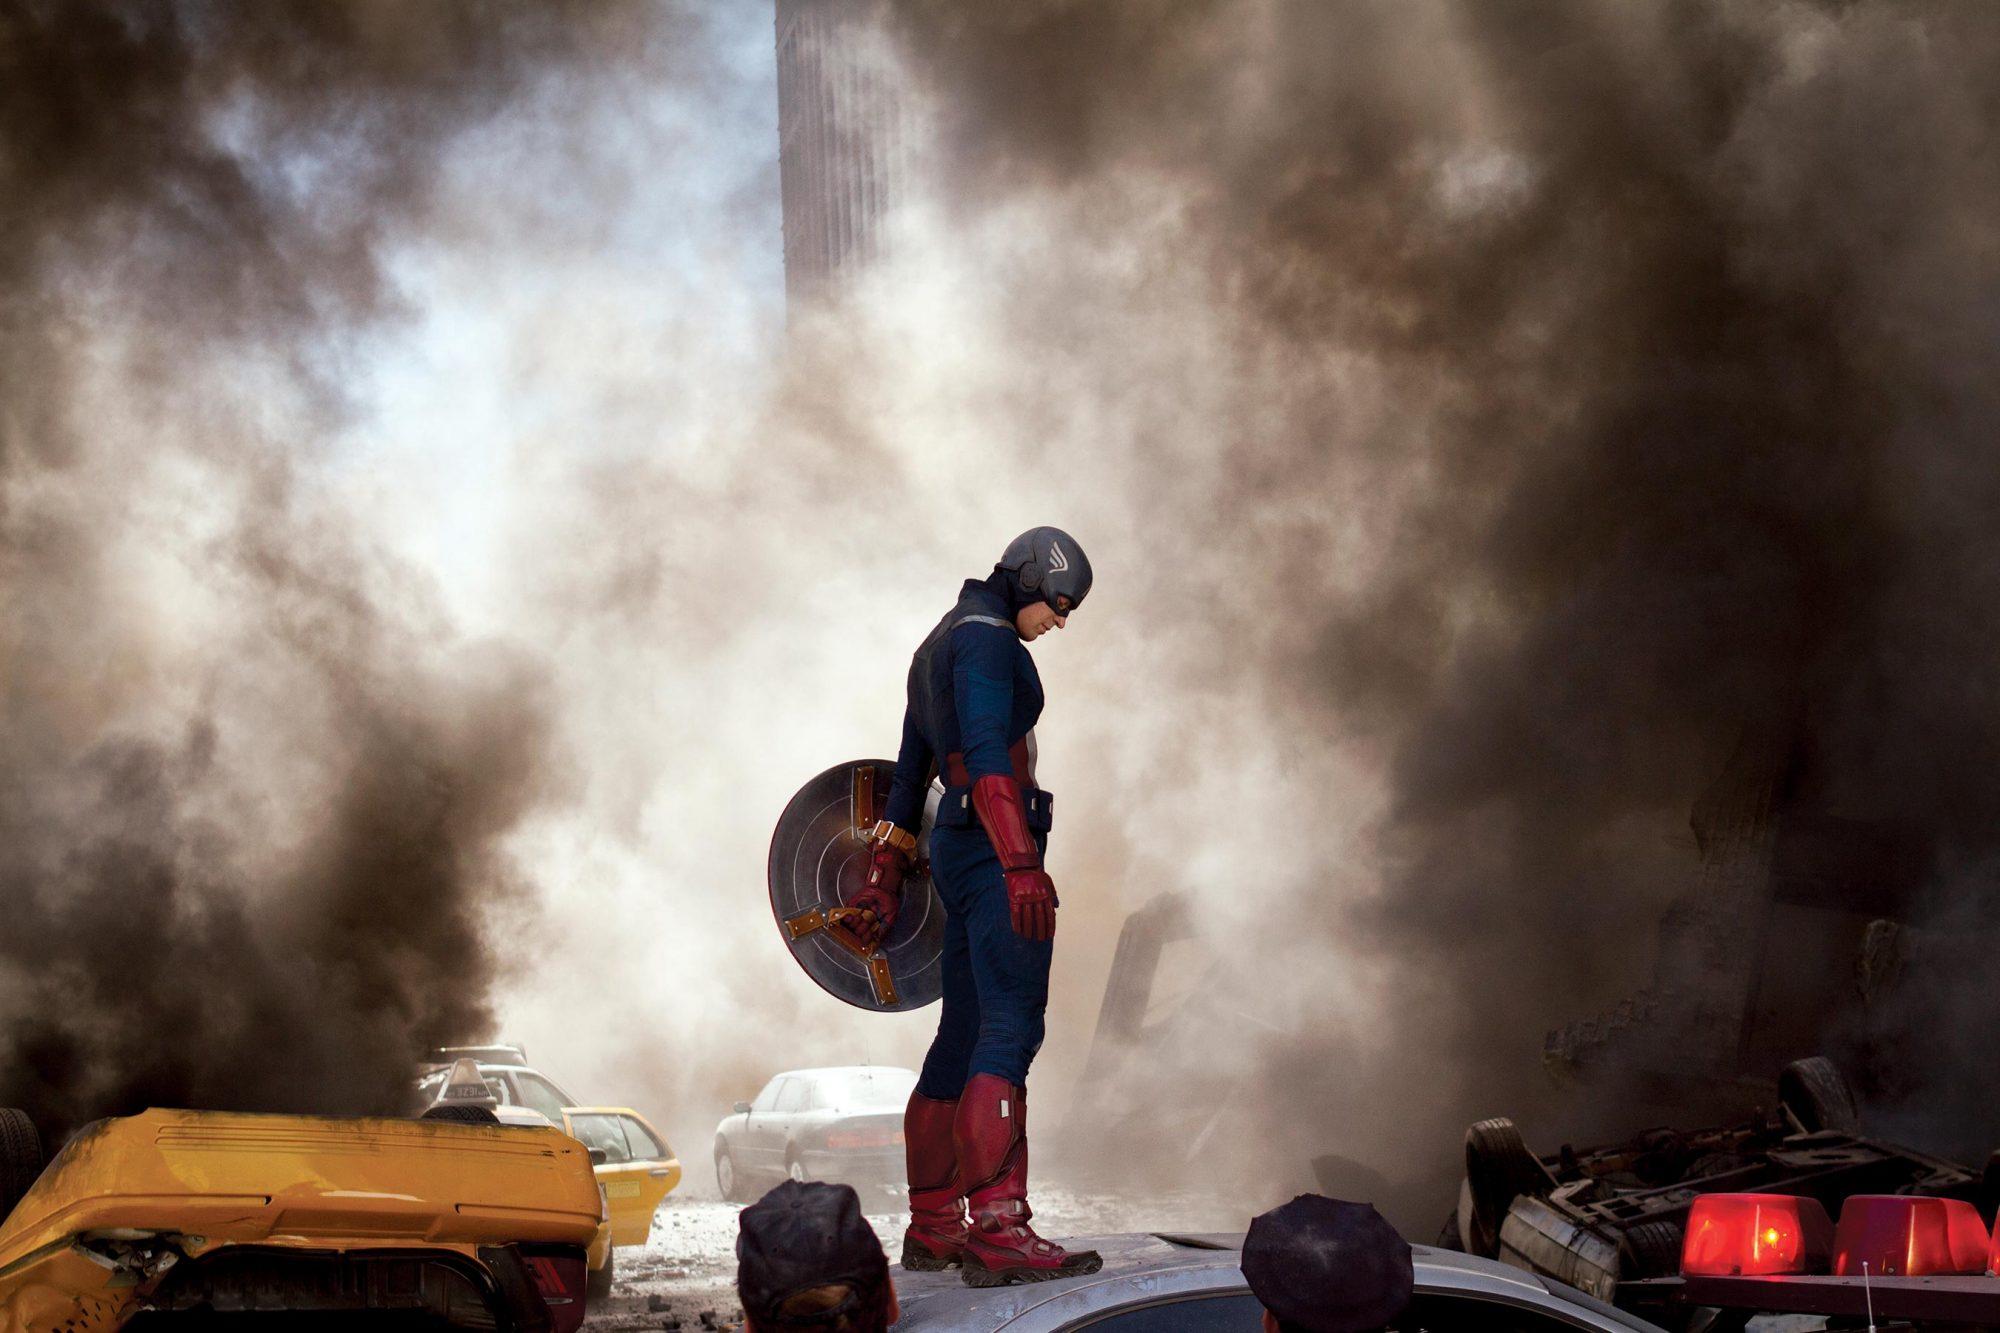 The Avengers (2012)Captain America aka Steve Rogers played by Chris Evans